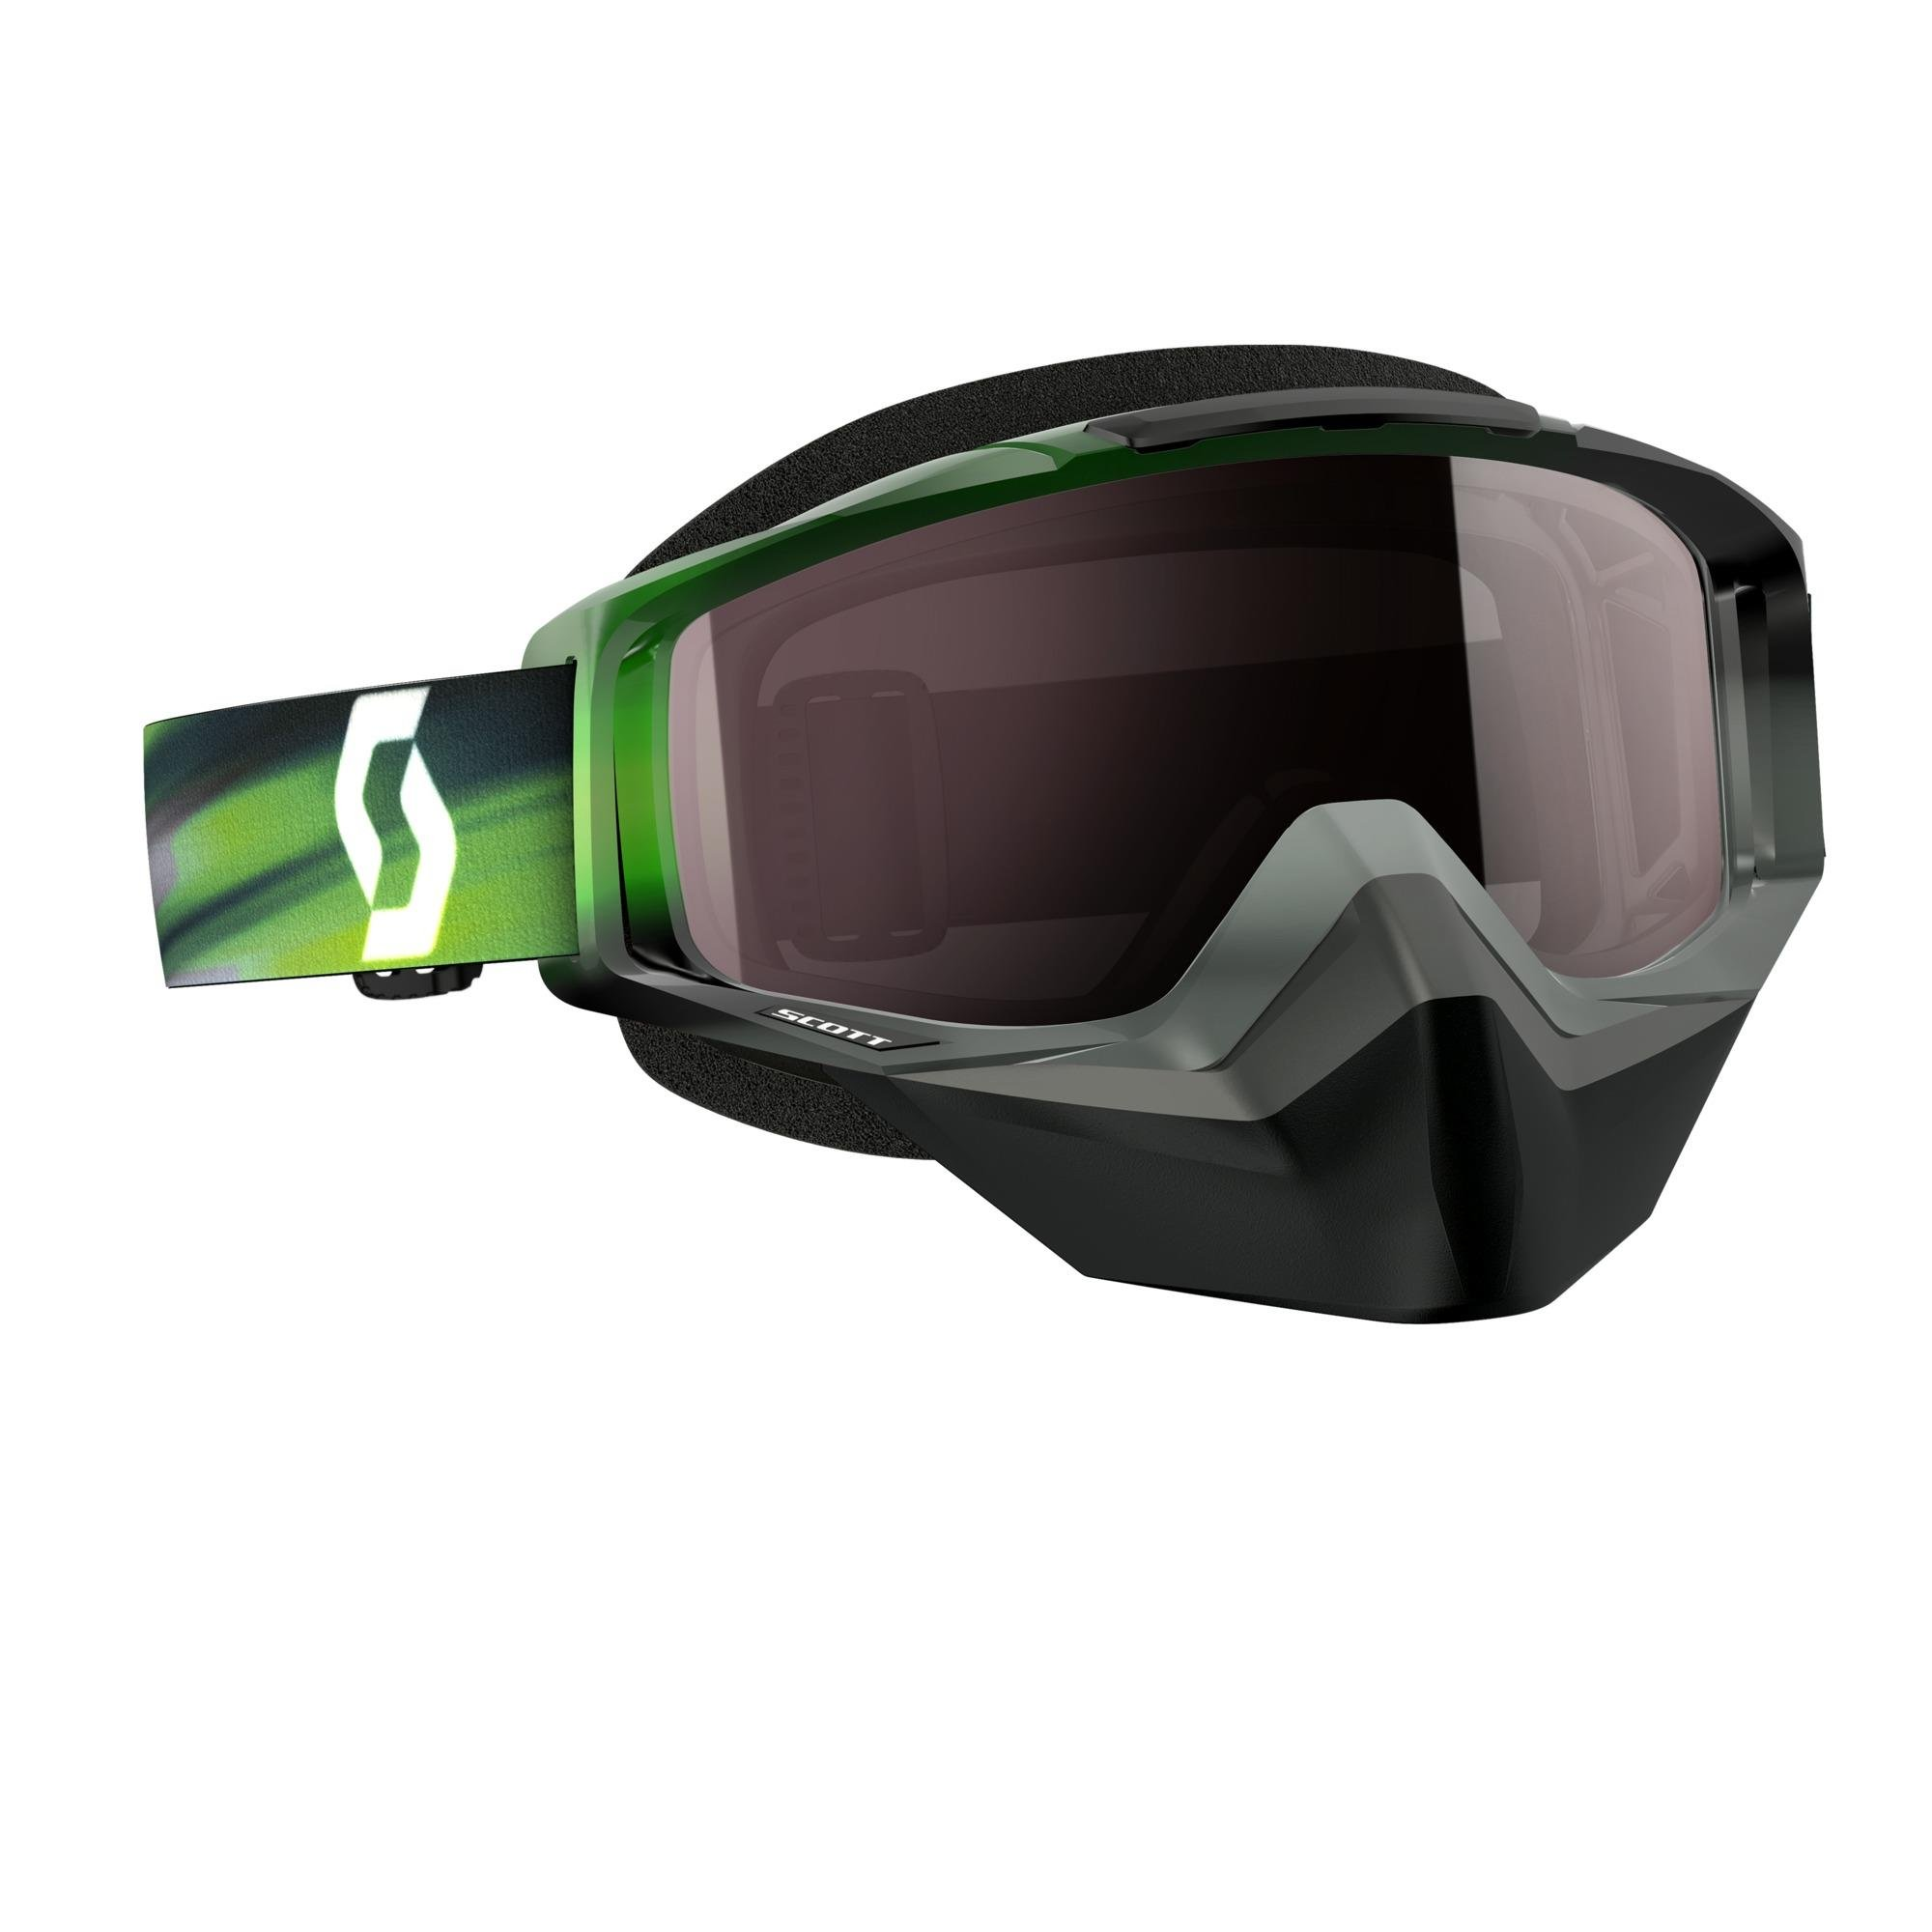 Scott Tyrant Men's Snocross Snowmobile Goggles Eyewear - Speed Grey/Green/Silver Chrome / One Size by Scott Sports